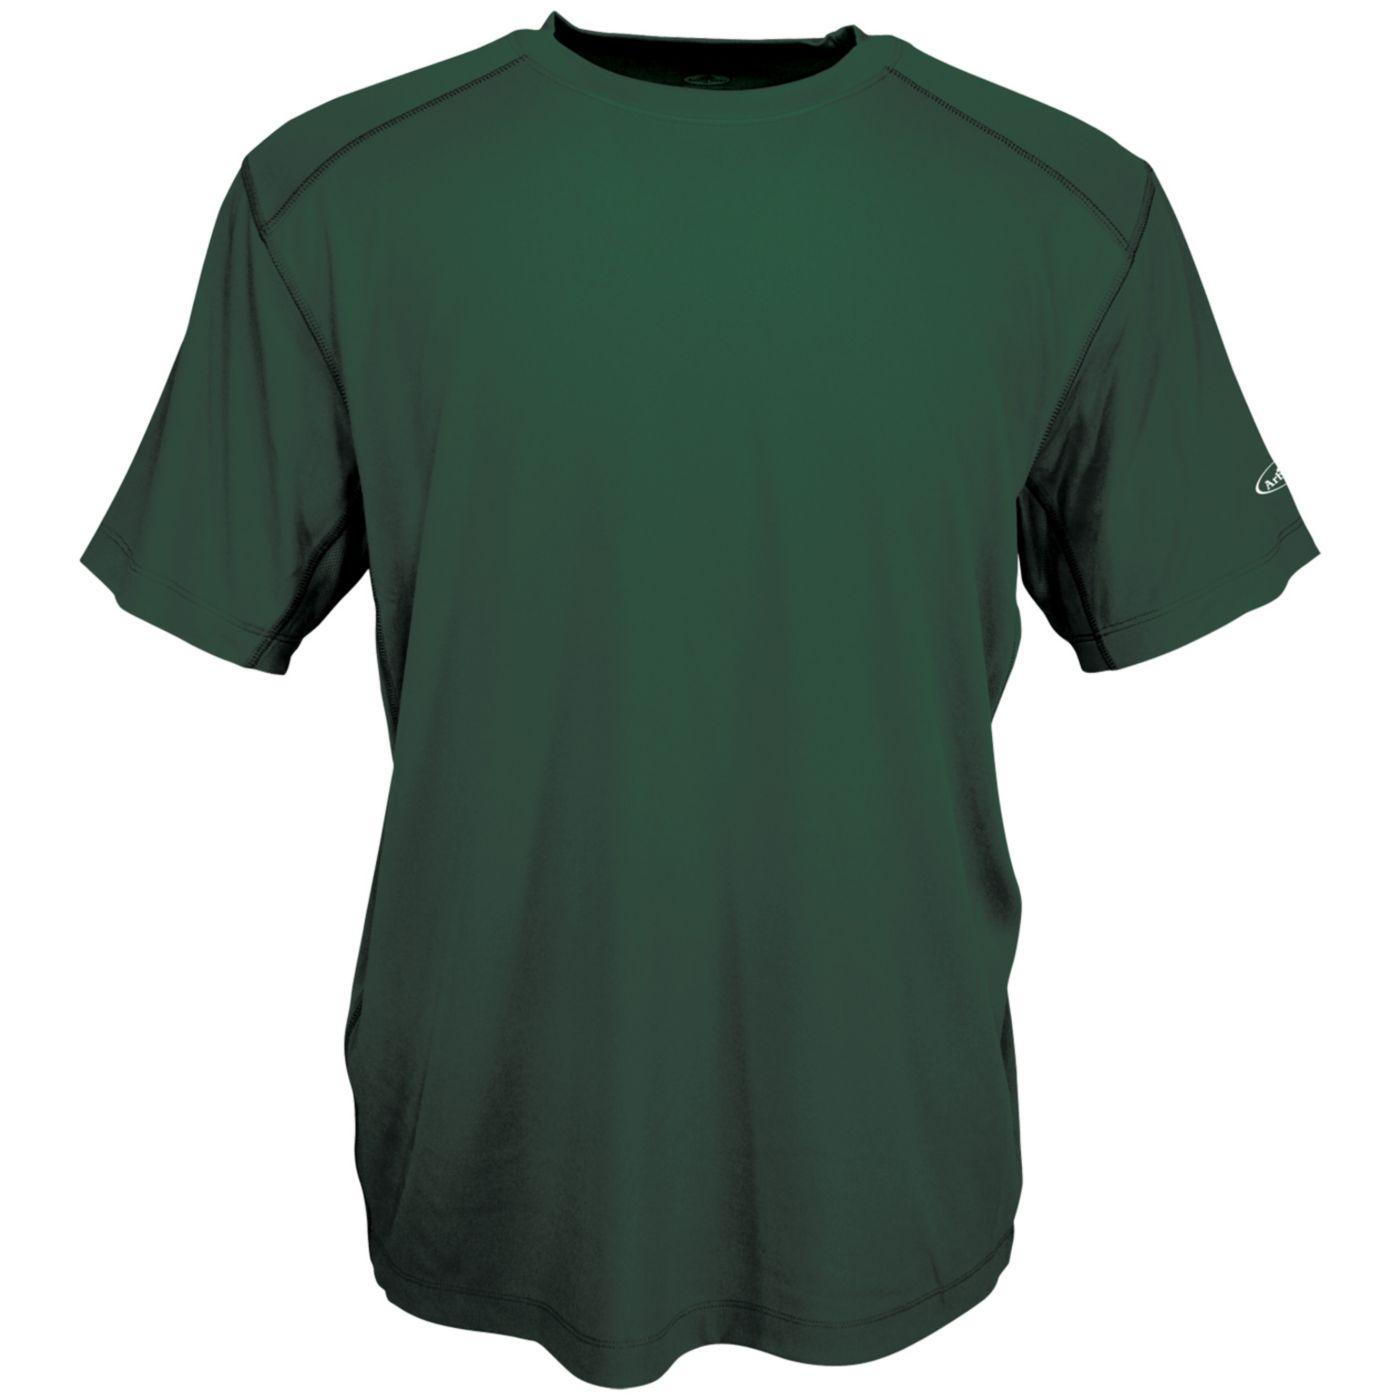 Arborwear Men's Transpiration T-Shirt